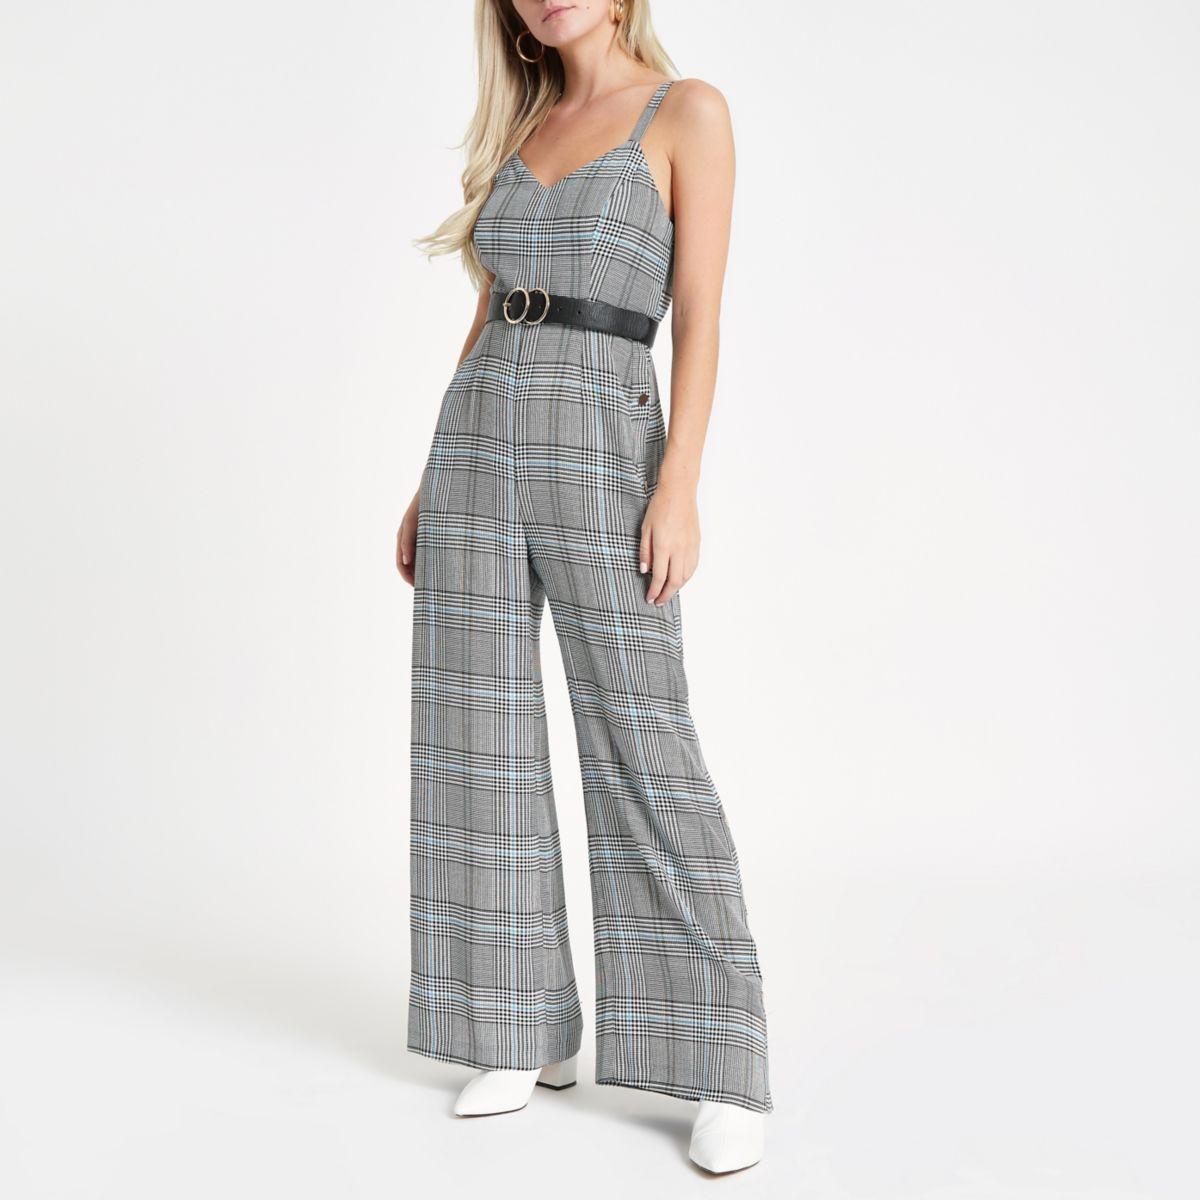 Petite grey check popper side jumpsuit